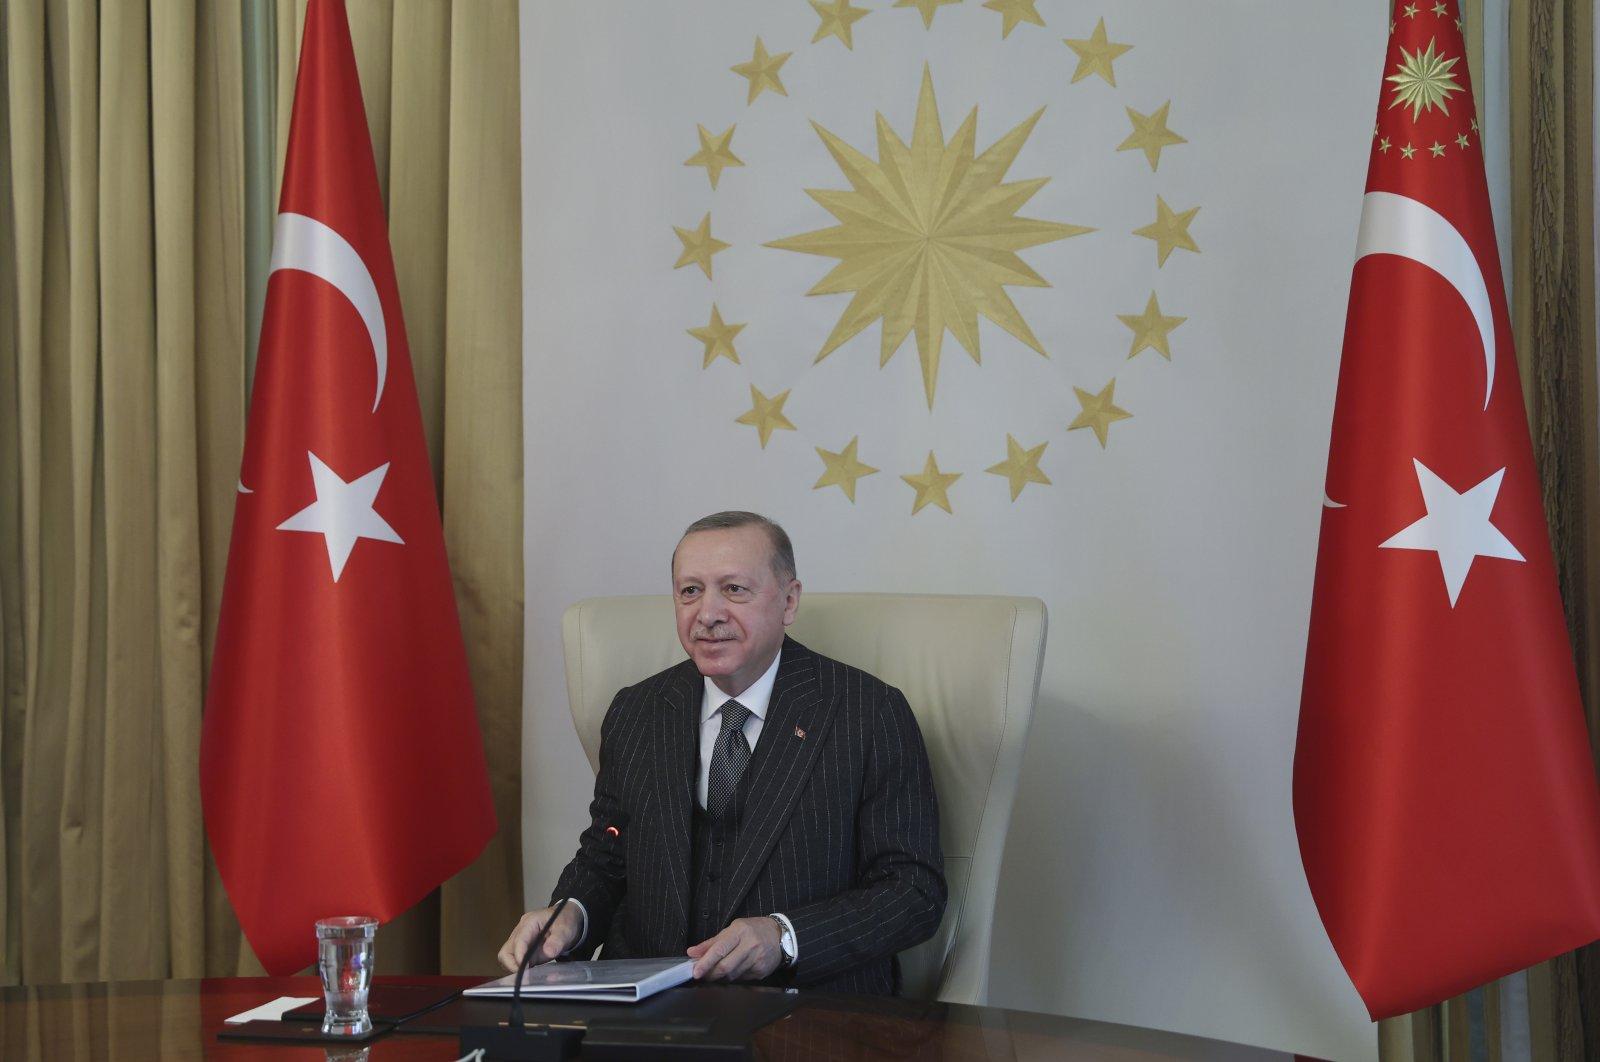 Turkey's President Recep Tayyip Erdoğan speaks in a videoconference with European Commission President Ursula von der Leyen and European Council President Charles Michel, in Istanbul, Turkey, March 19, 2021. (AP Photo)